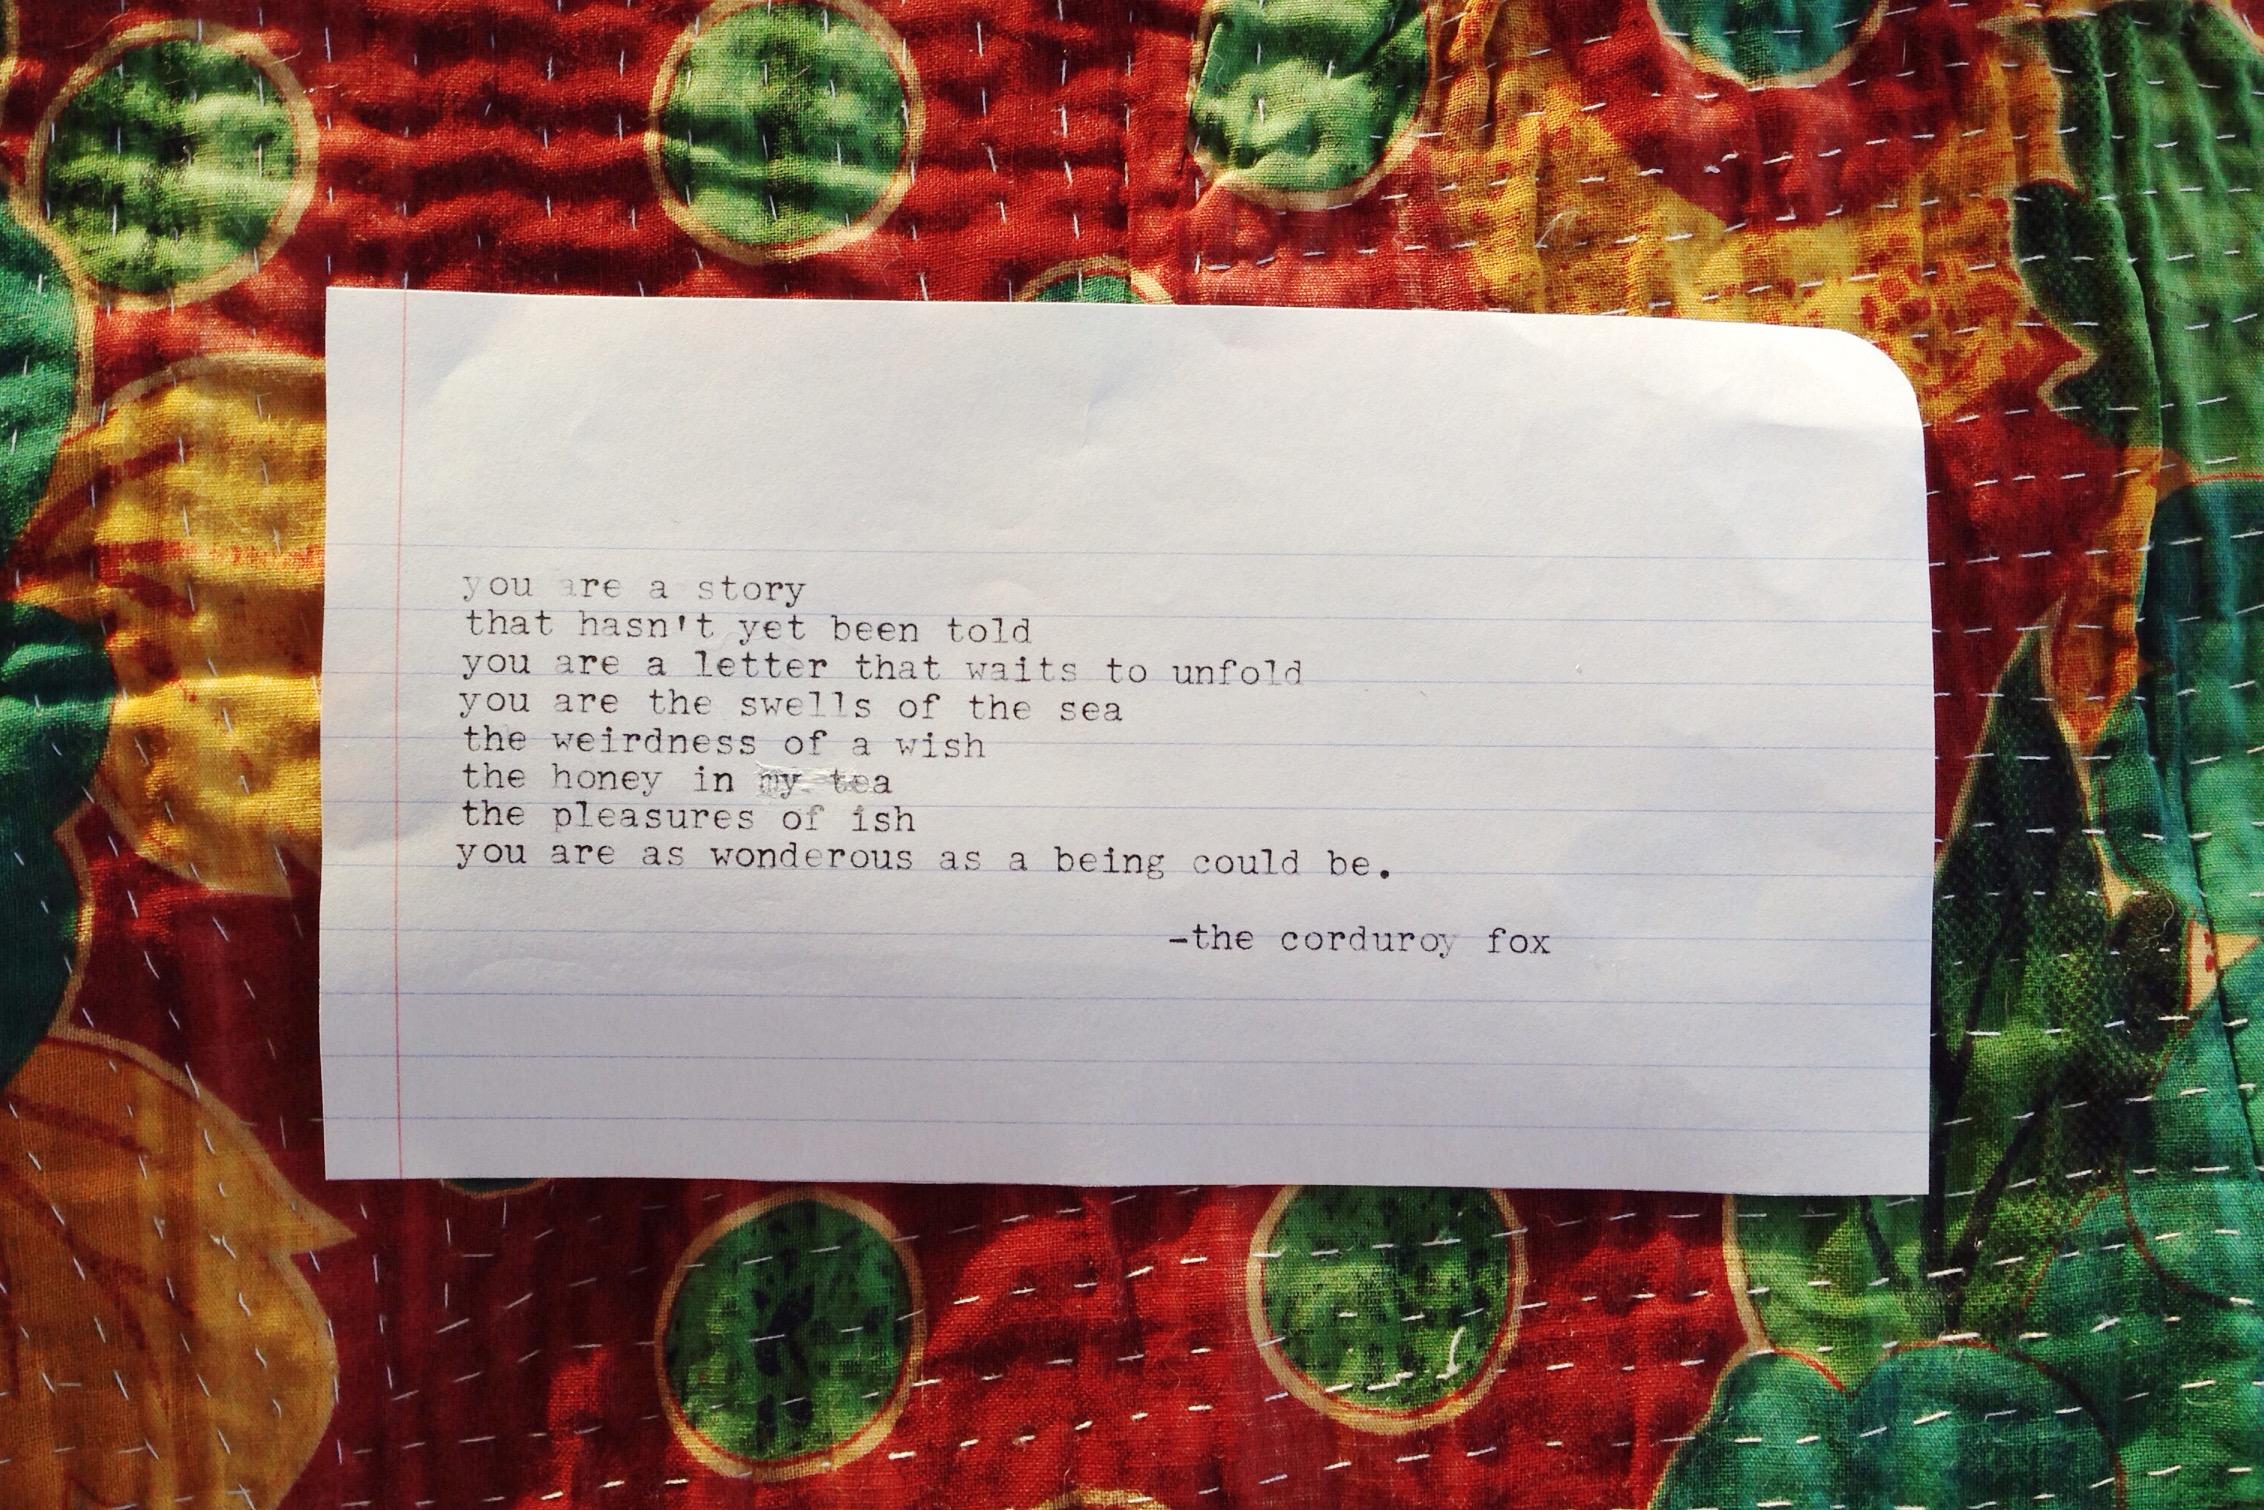 Nameless Poem by The Corduroy Fox